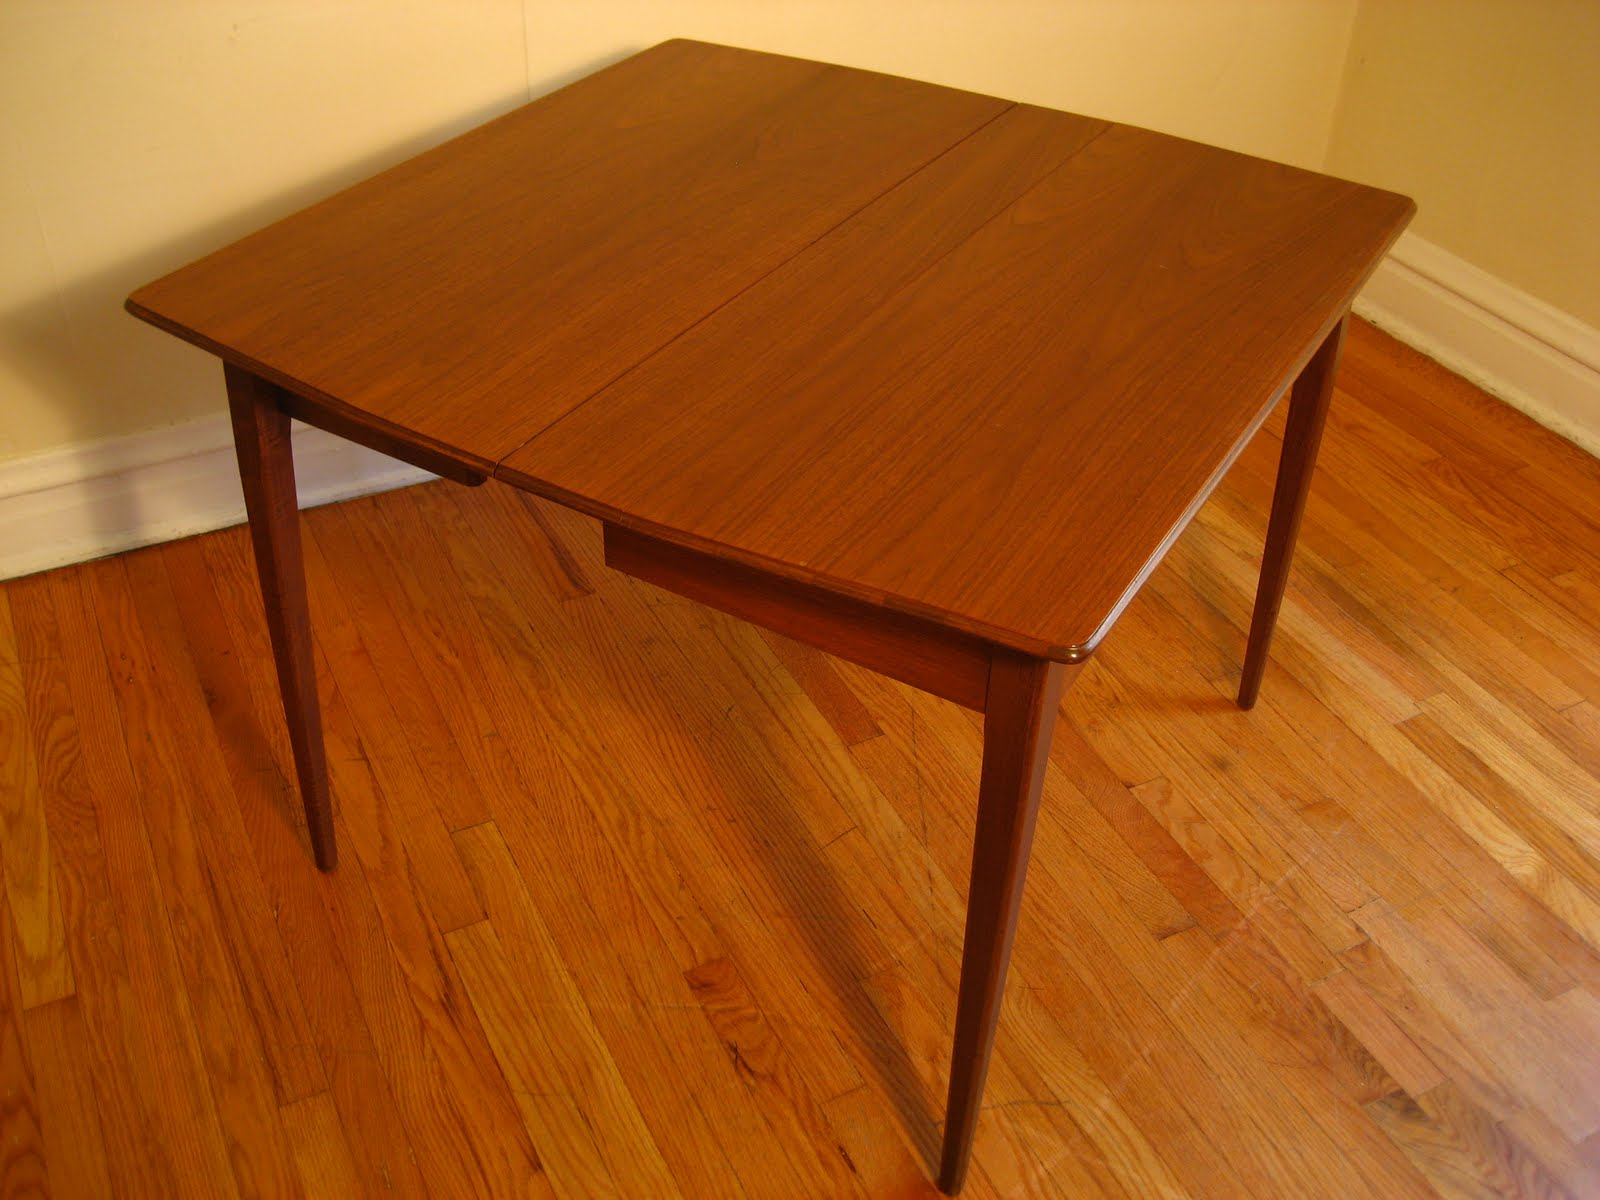 flatout design MCM Portable Dining Table : expandingdiningtable008 from flatoutdesign.blogspot.com size 1600 x 1200 jpeg 157kB